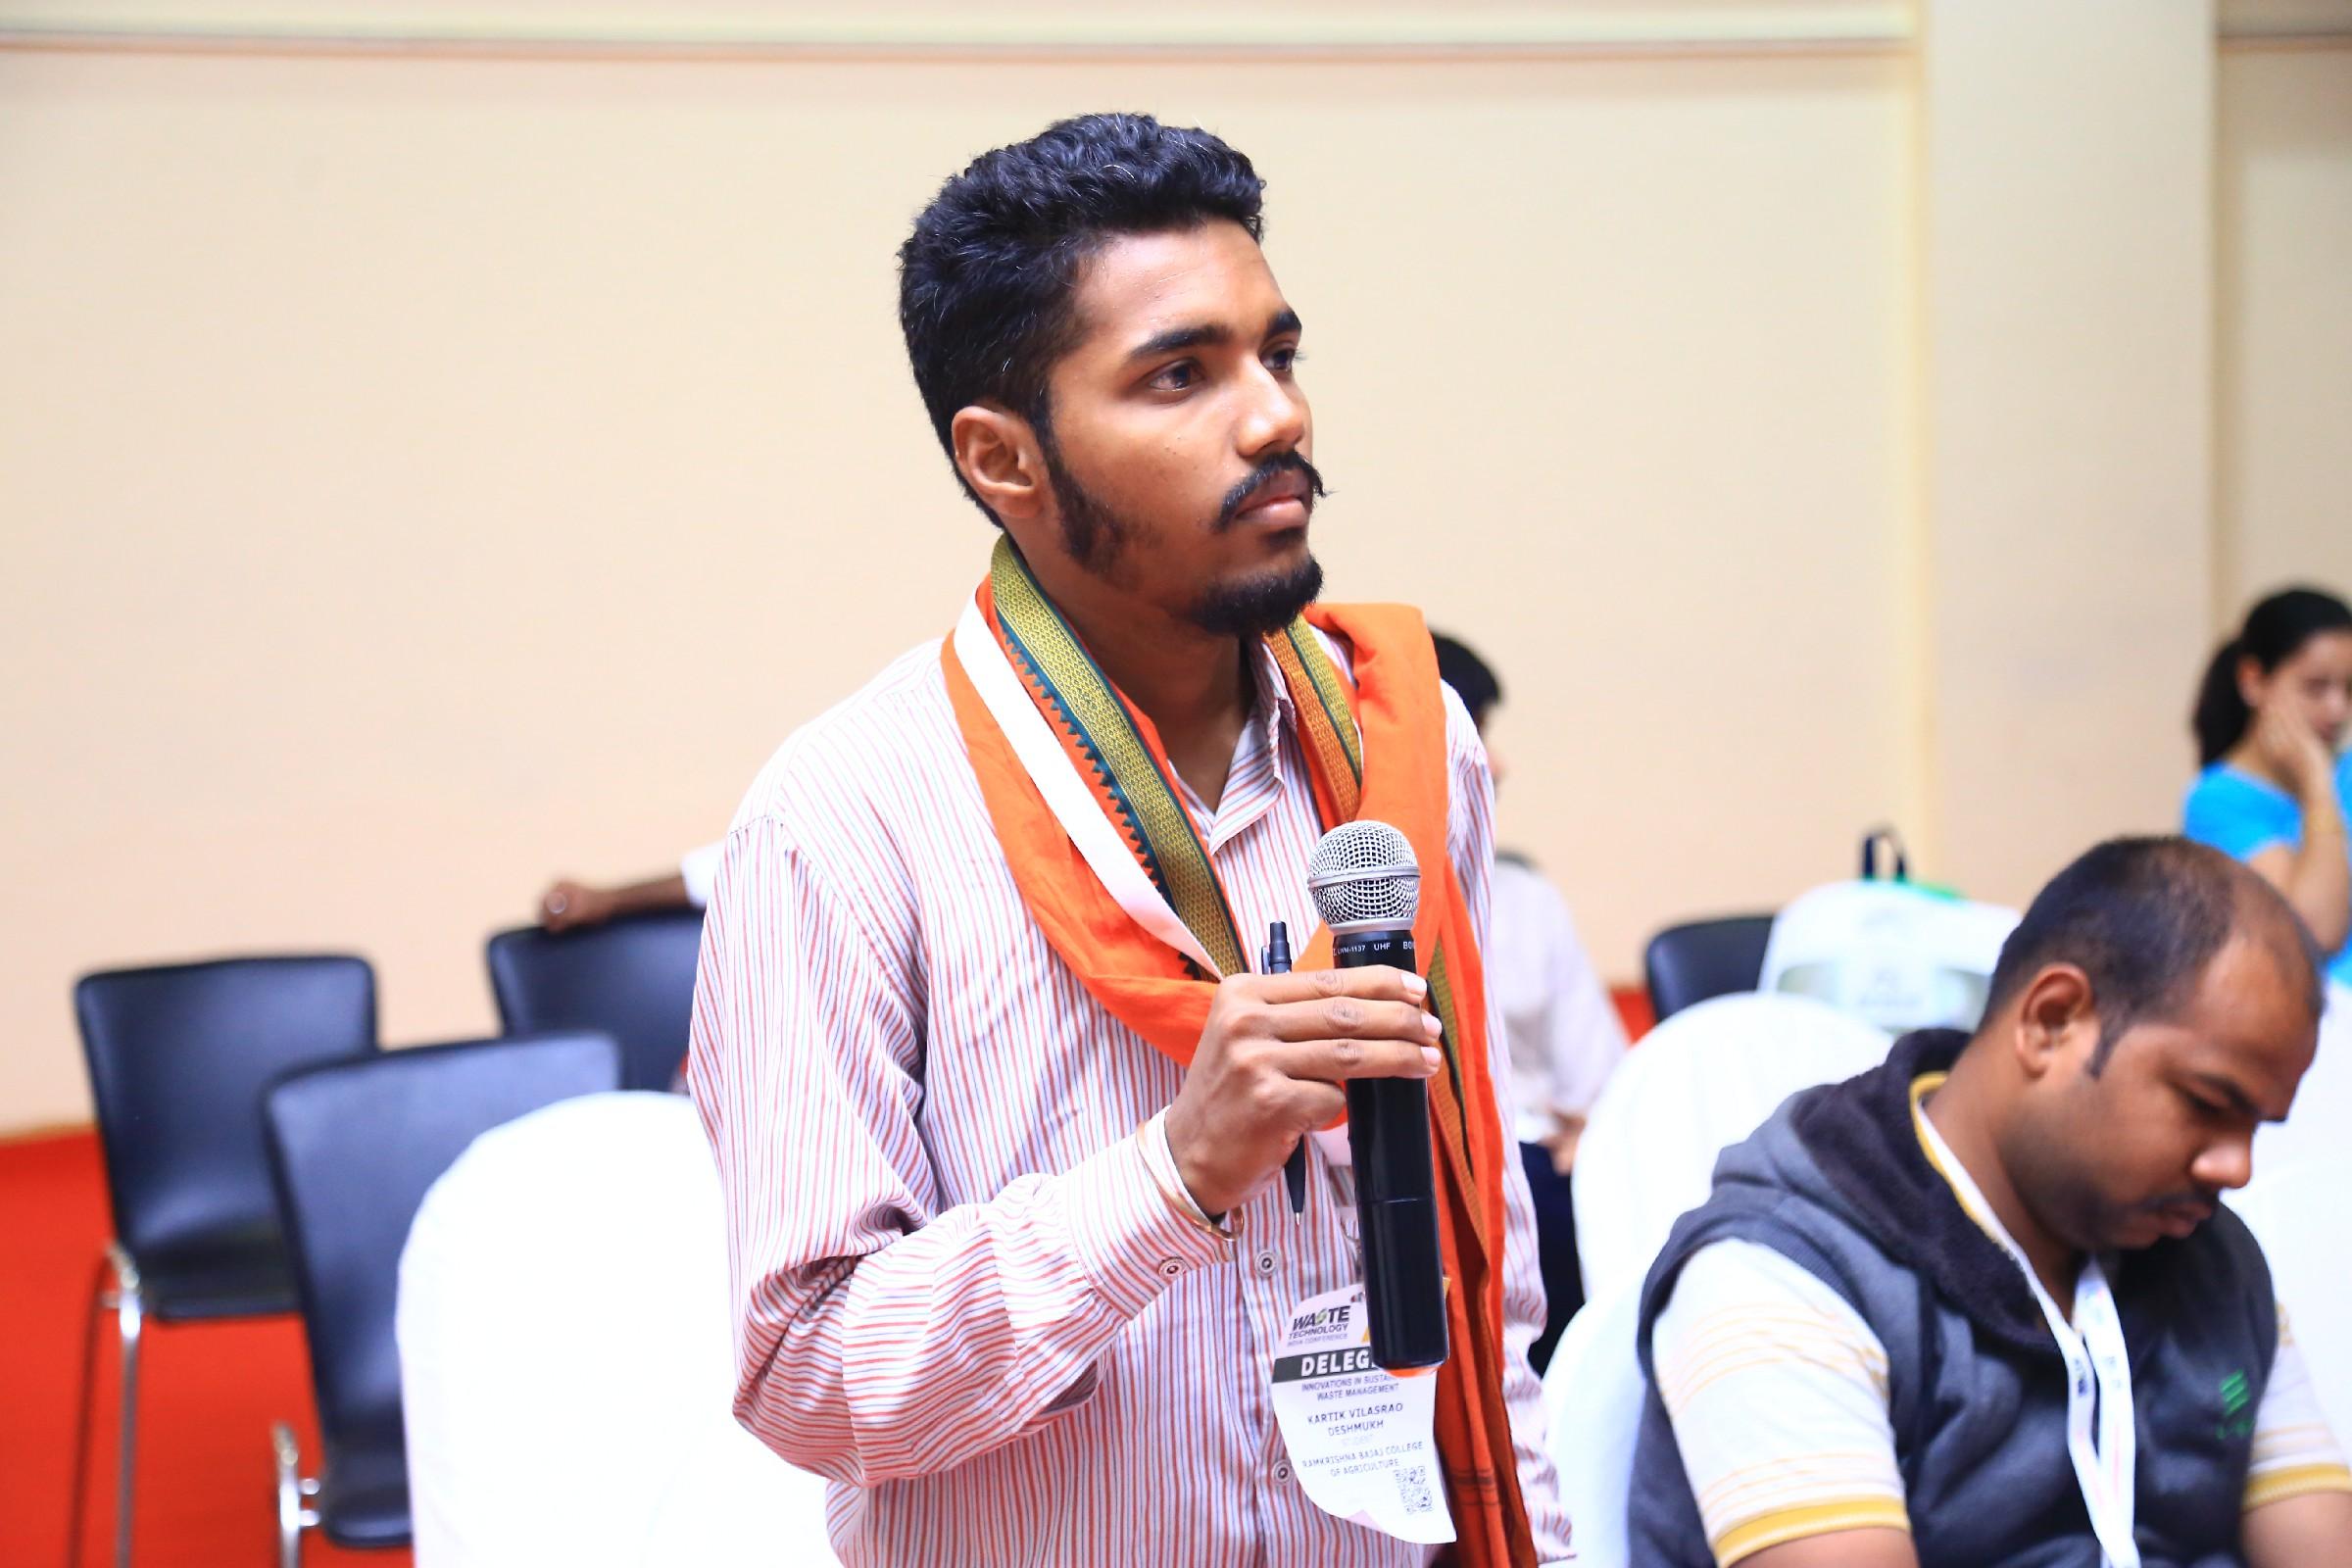 Kartik-Vilasrao-Deshmukh-Student-Ramkrishna-Bajaj-college-of-agriculture